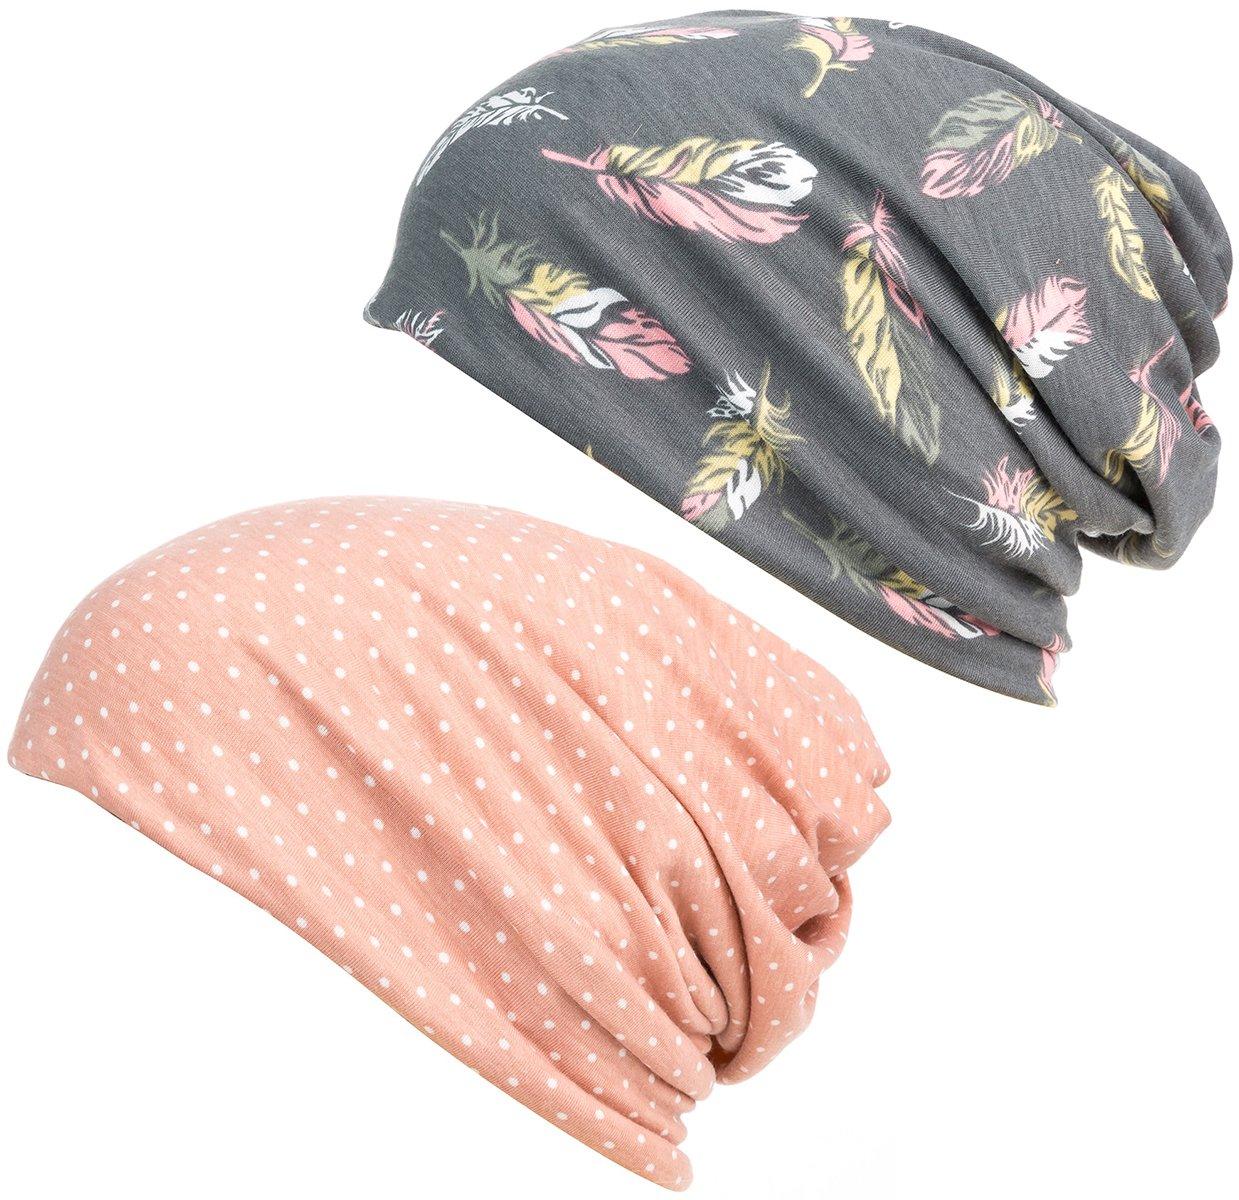 DancMolly Print Flower Cap Cancer Hats Beanie Stretch Casual Turbans for Women by DancMolly